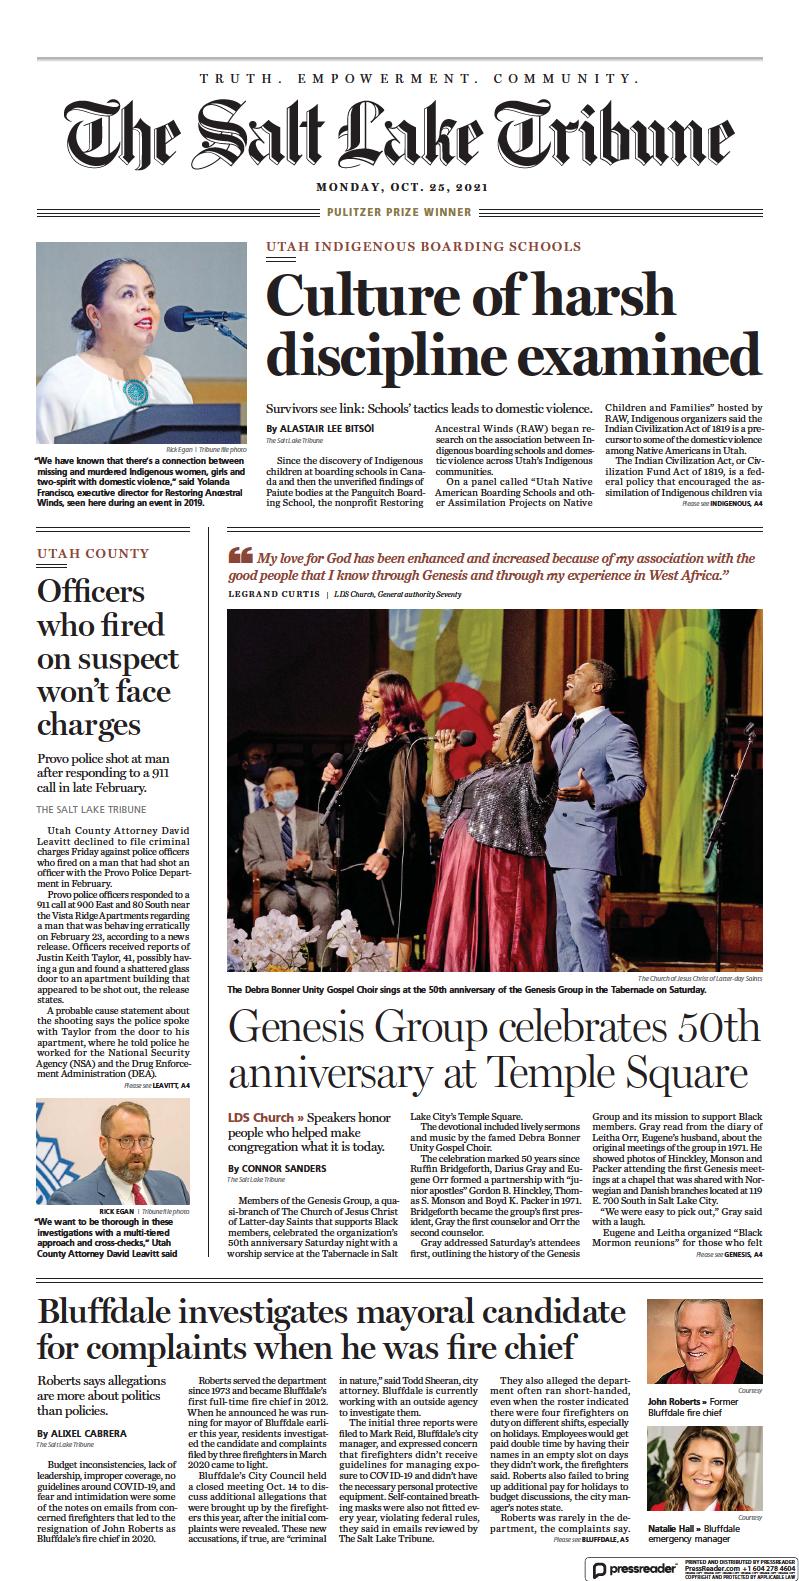 Click here to start reading The Salt Lake Tribune e-Edition